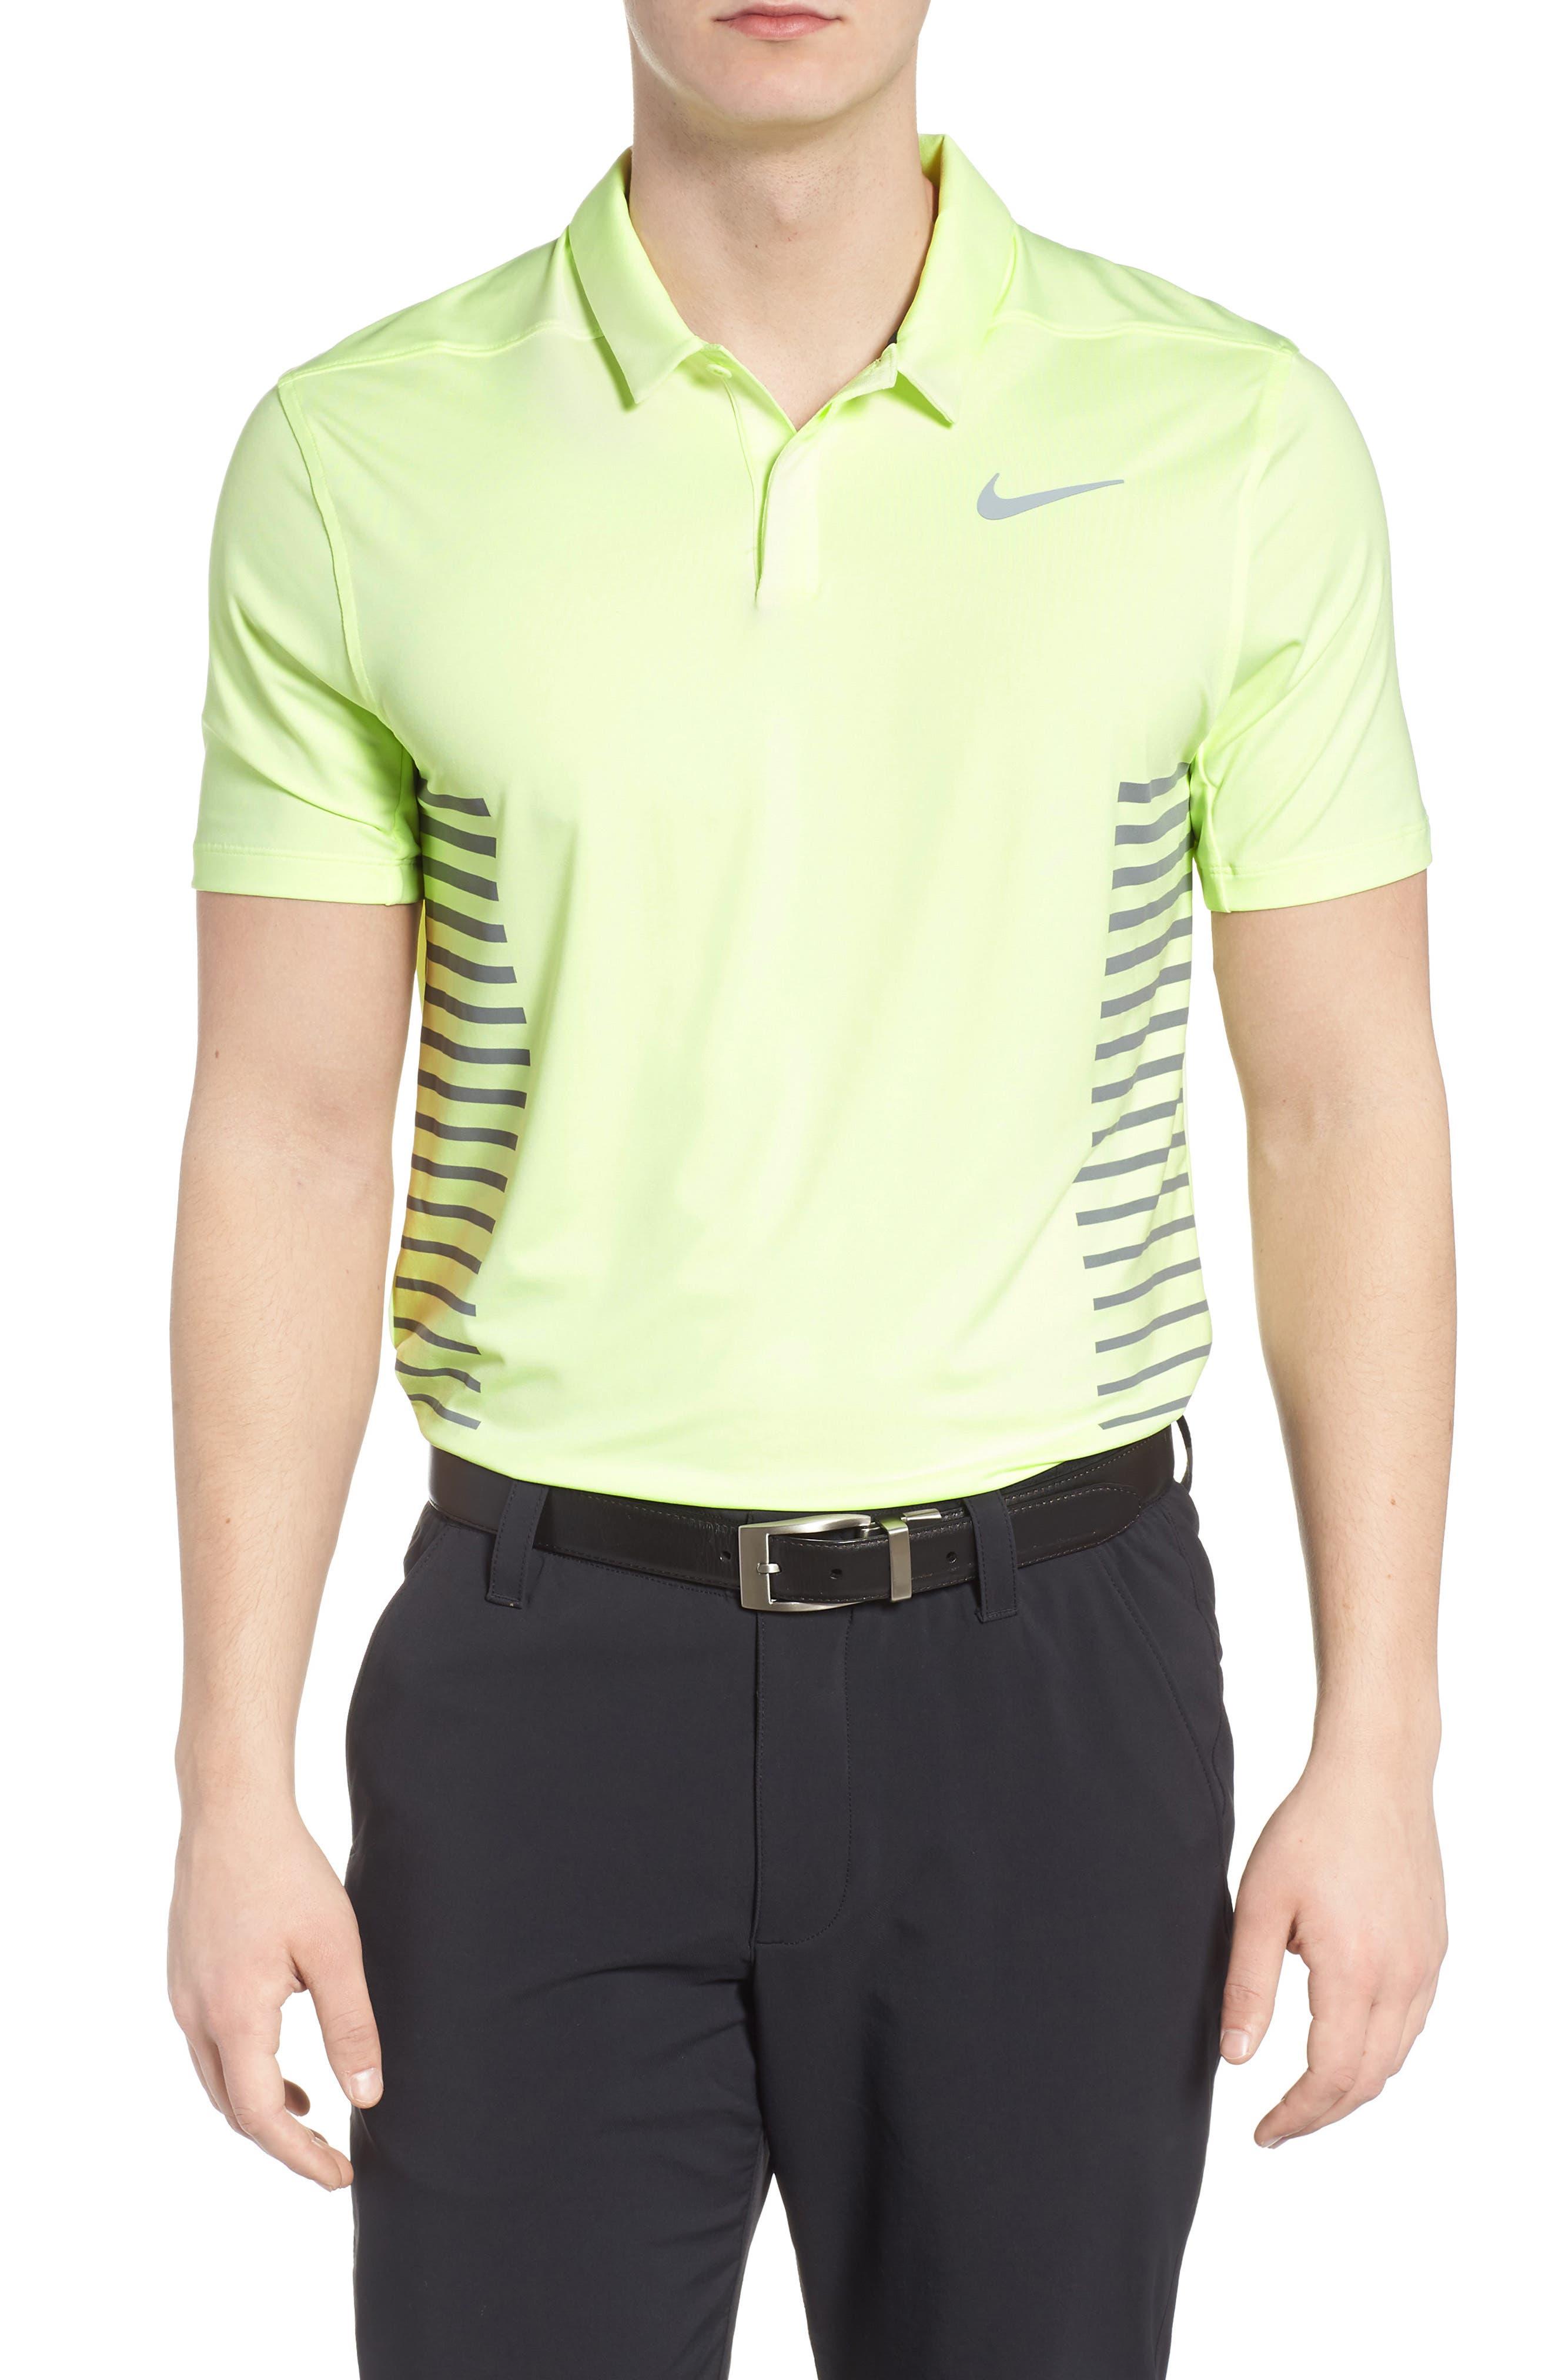 Nike Dry Polo Shirt, Yellow